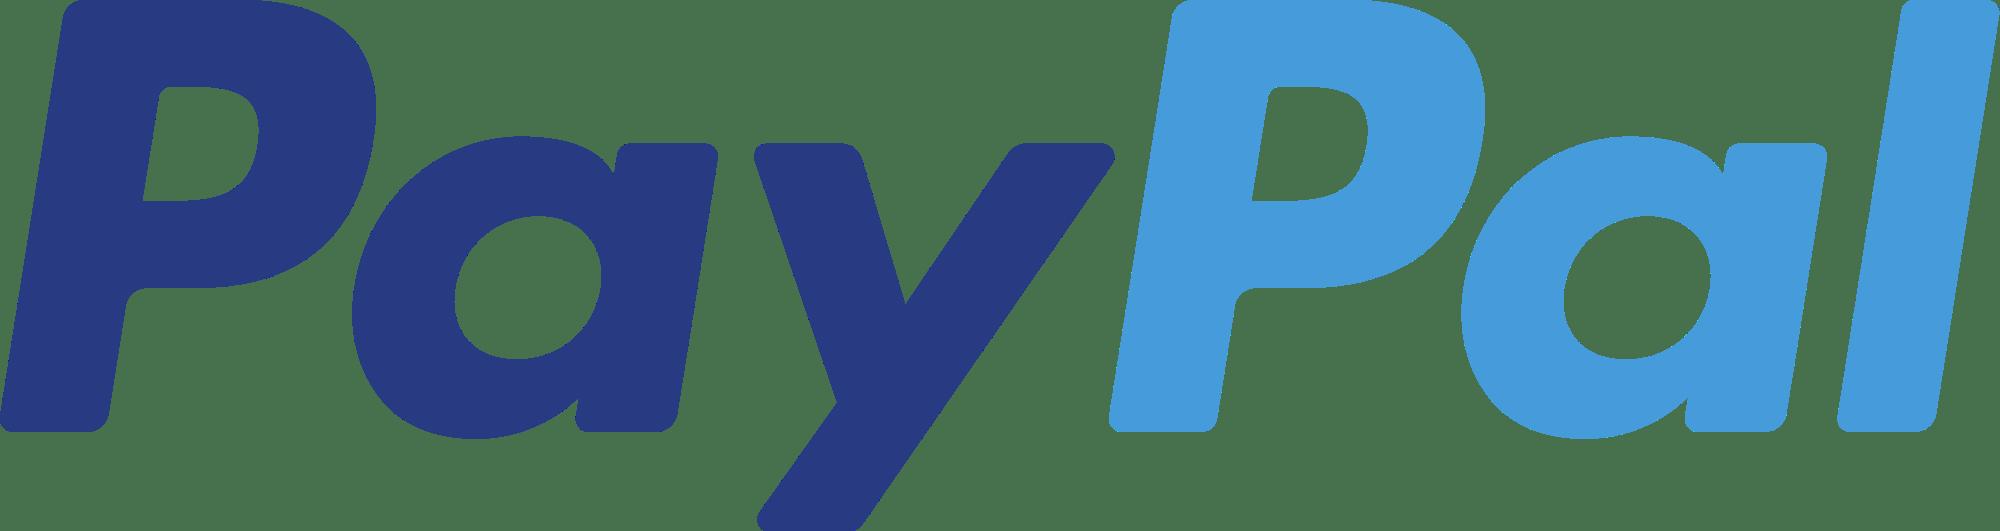 PayPal logo PNG images free download